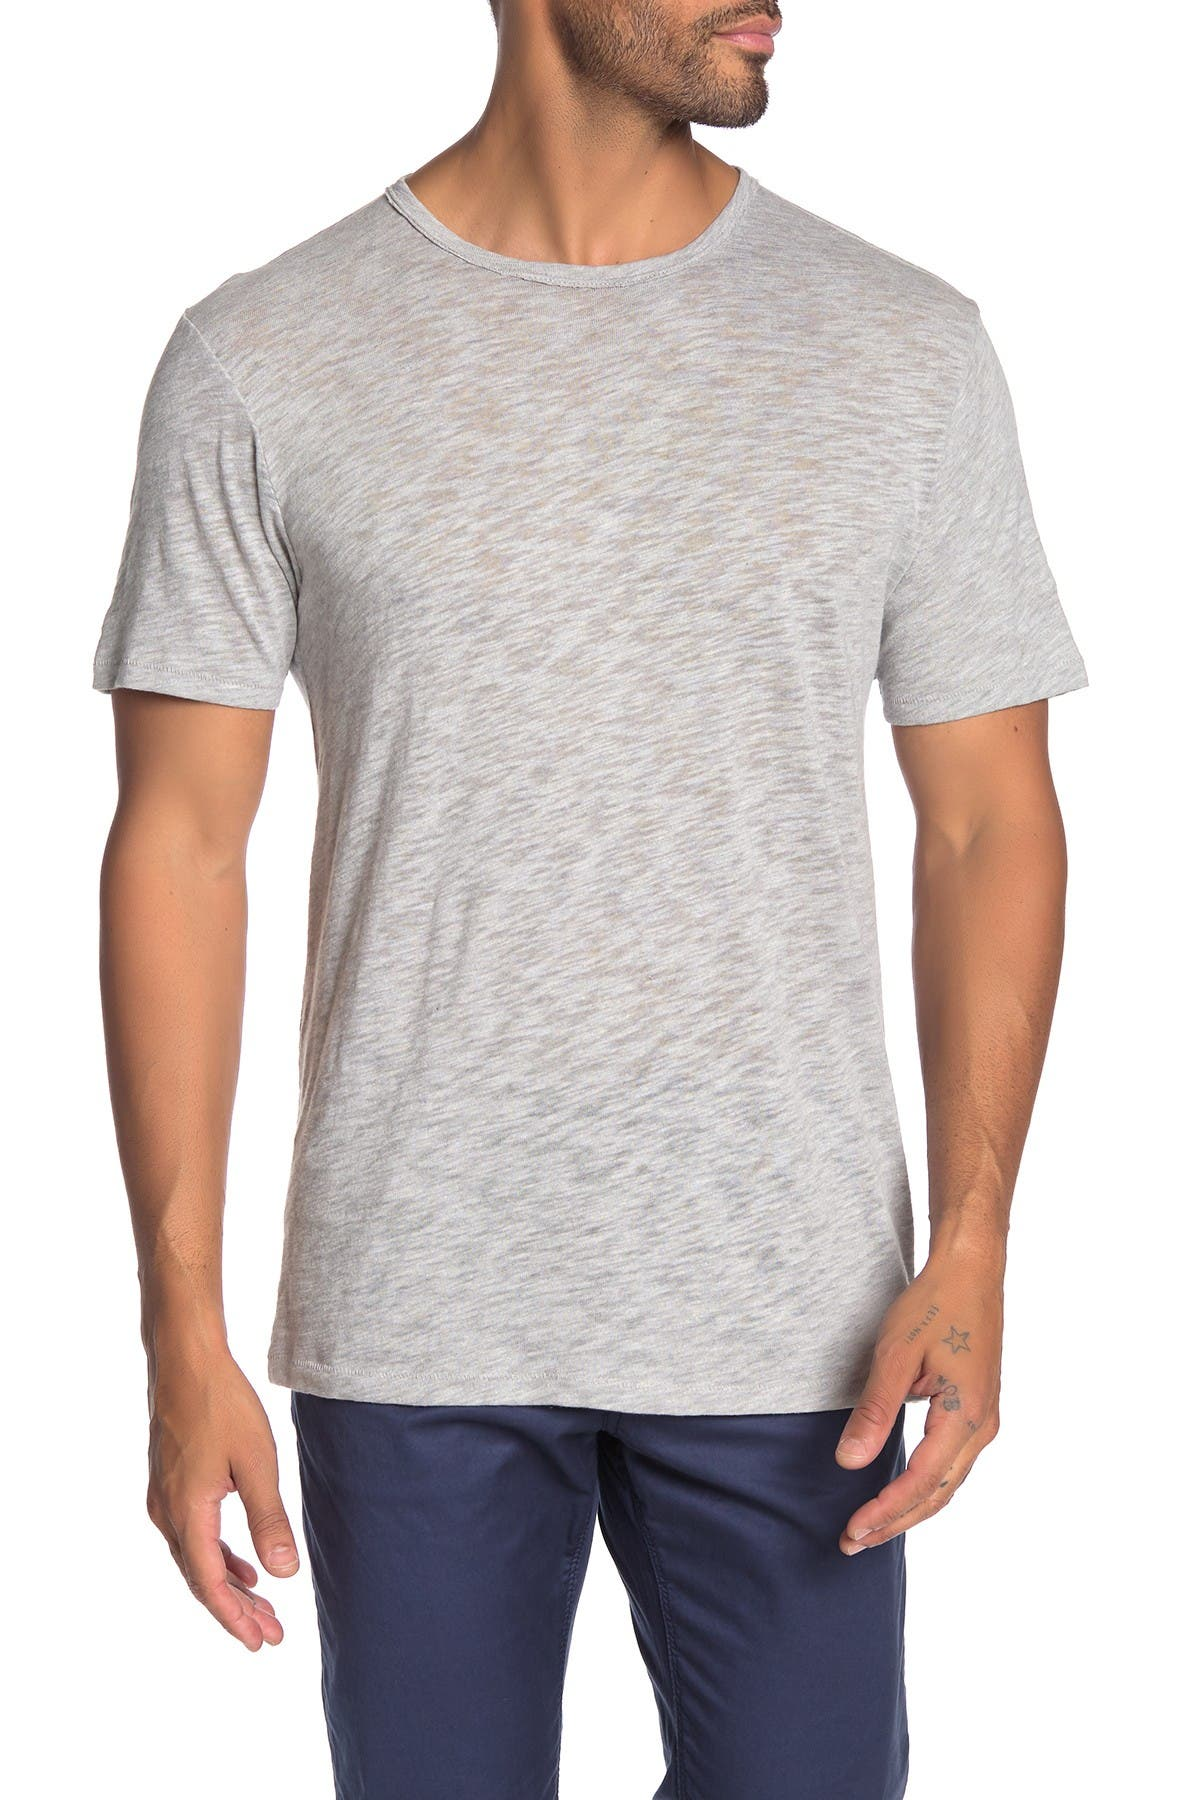 Image of Rag & Bone Core Crew Neck Slub T-Shirt